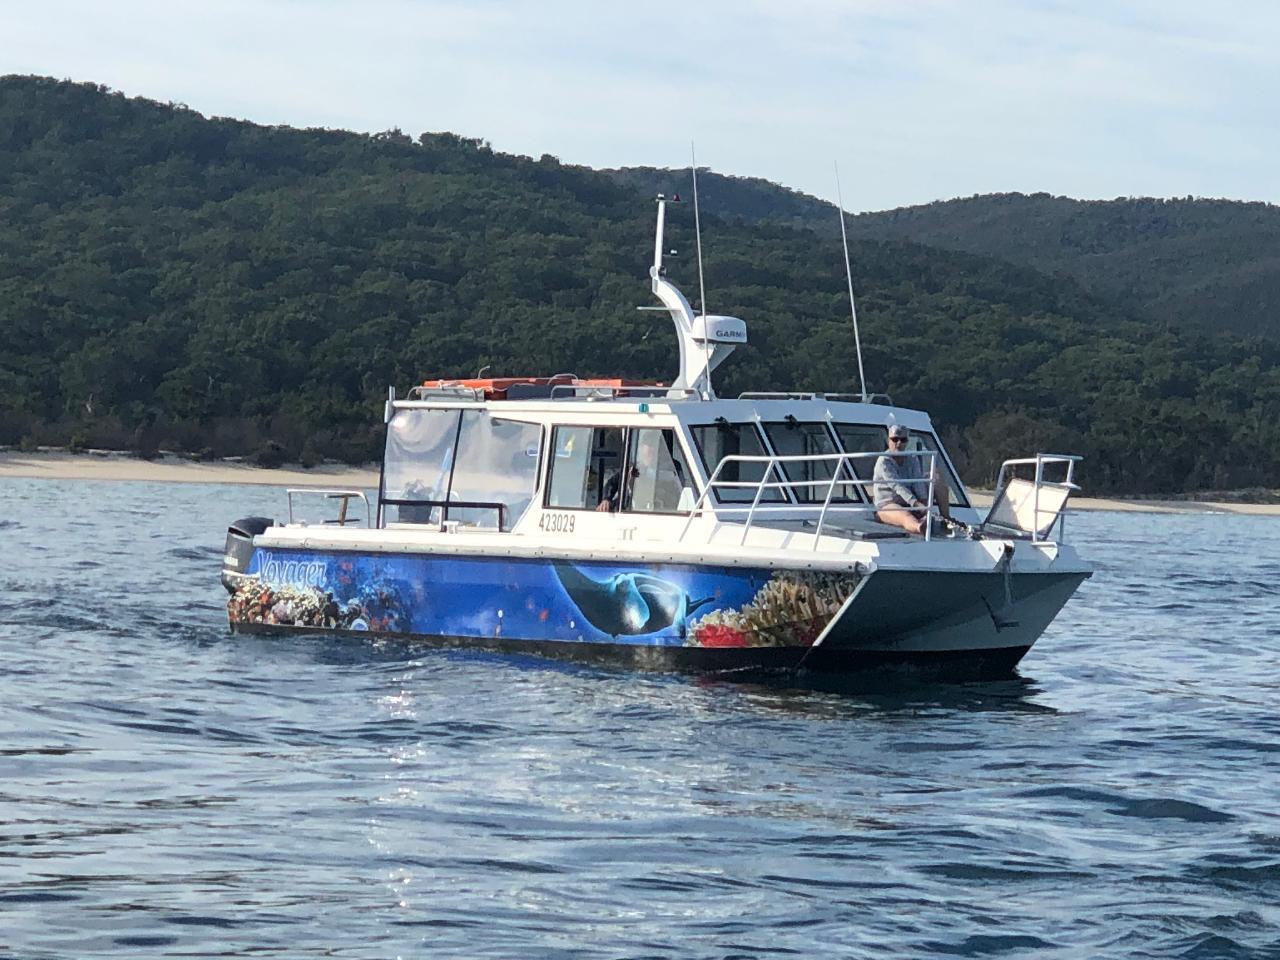 2 Dive Trip - Cementco Wreck and Flinders Reef Night Dive